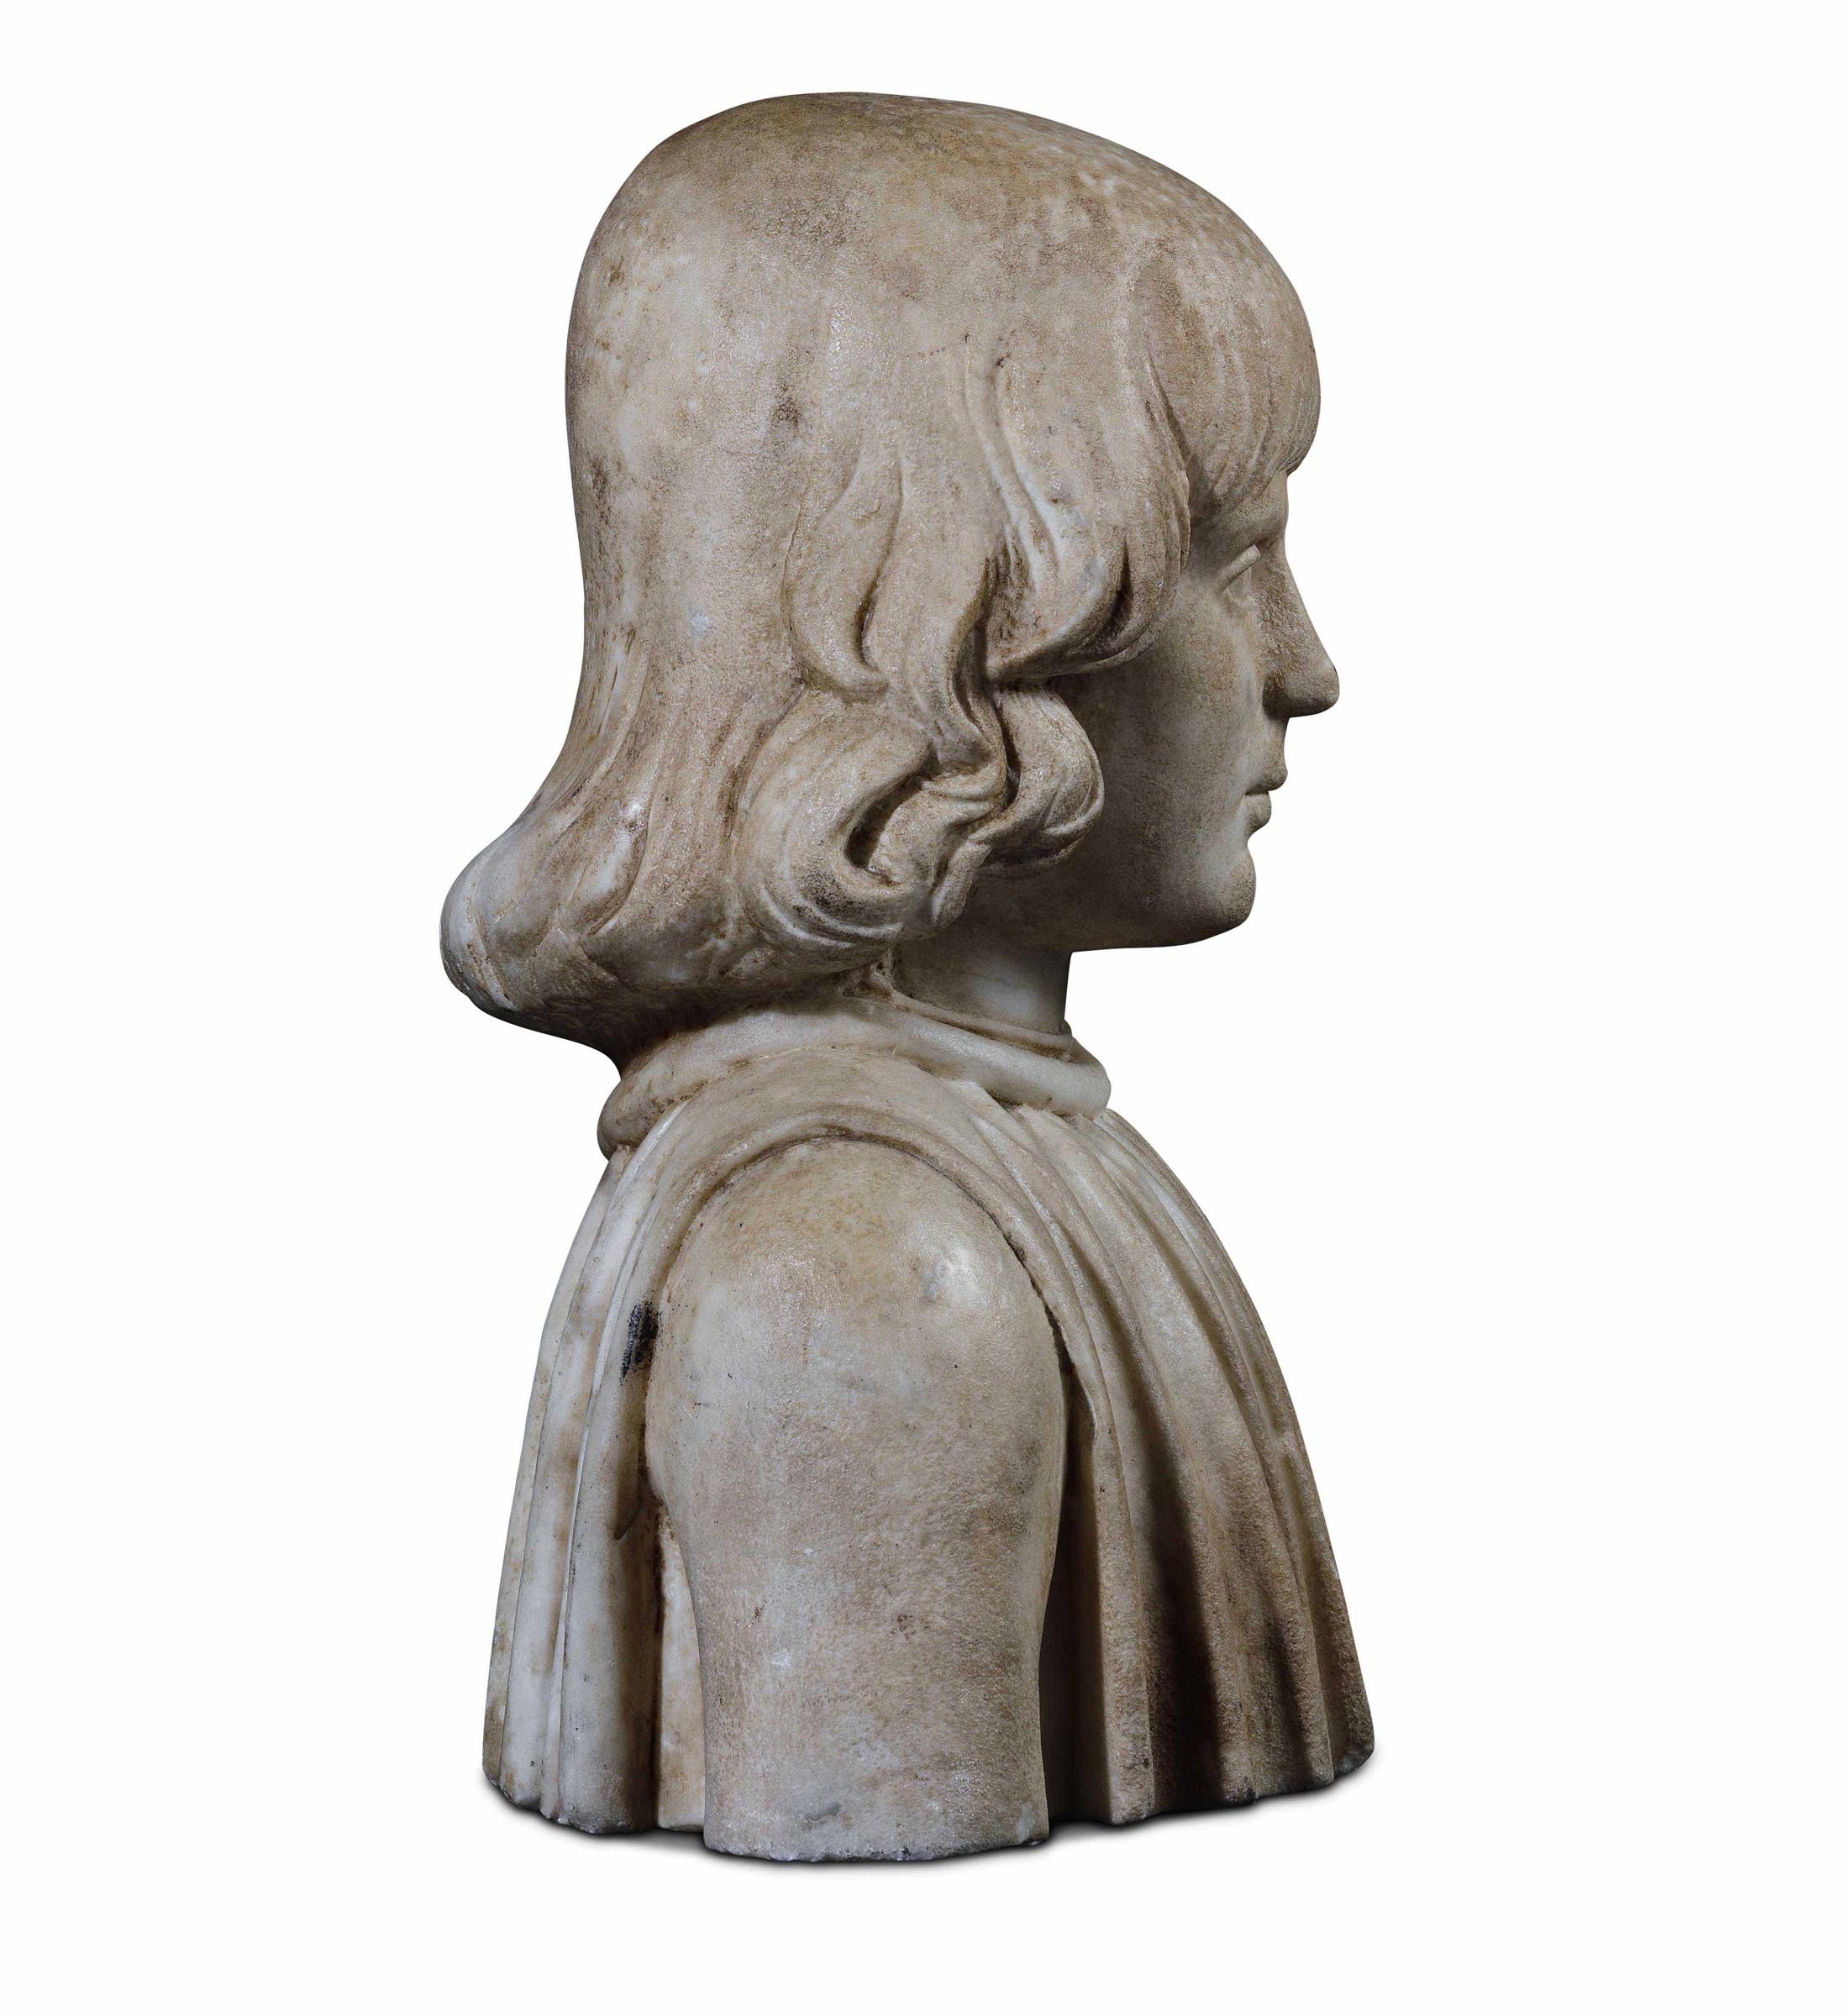 A marble bust, attr. F. Laurana, 1400s - cm 41x32x22. L'opera è accompagnata da una [...] - Image 2 of 4